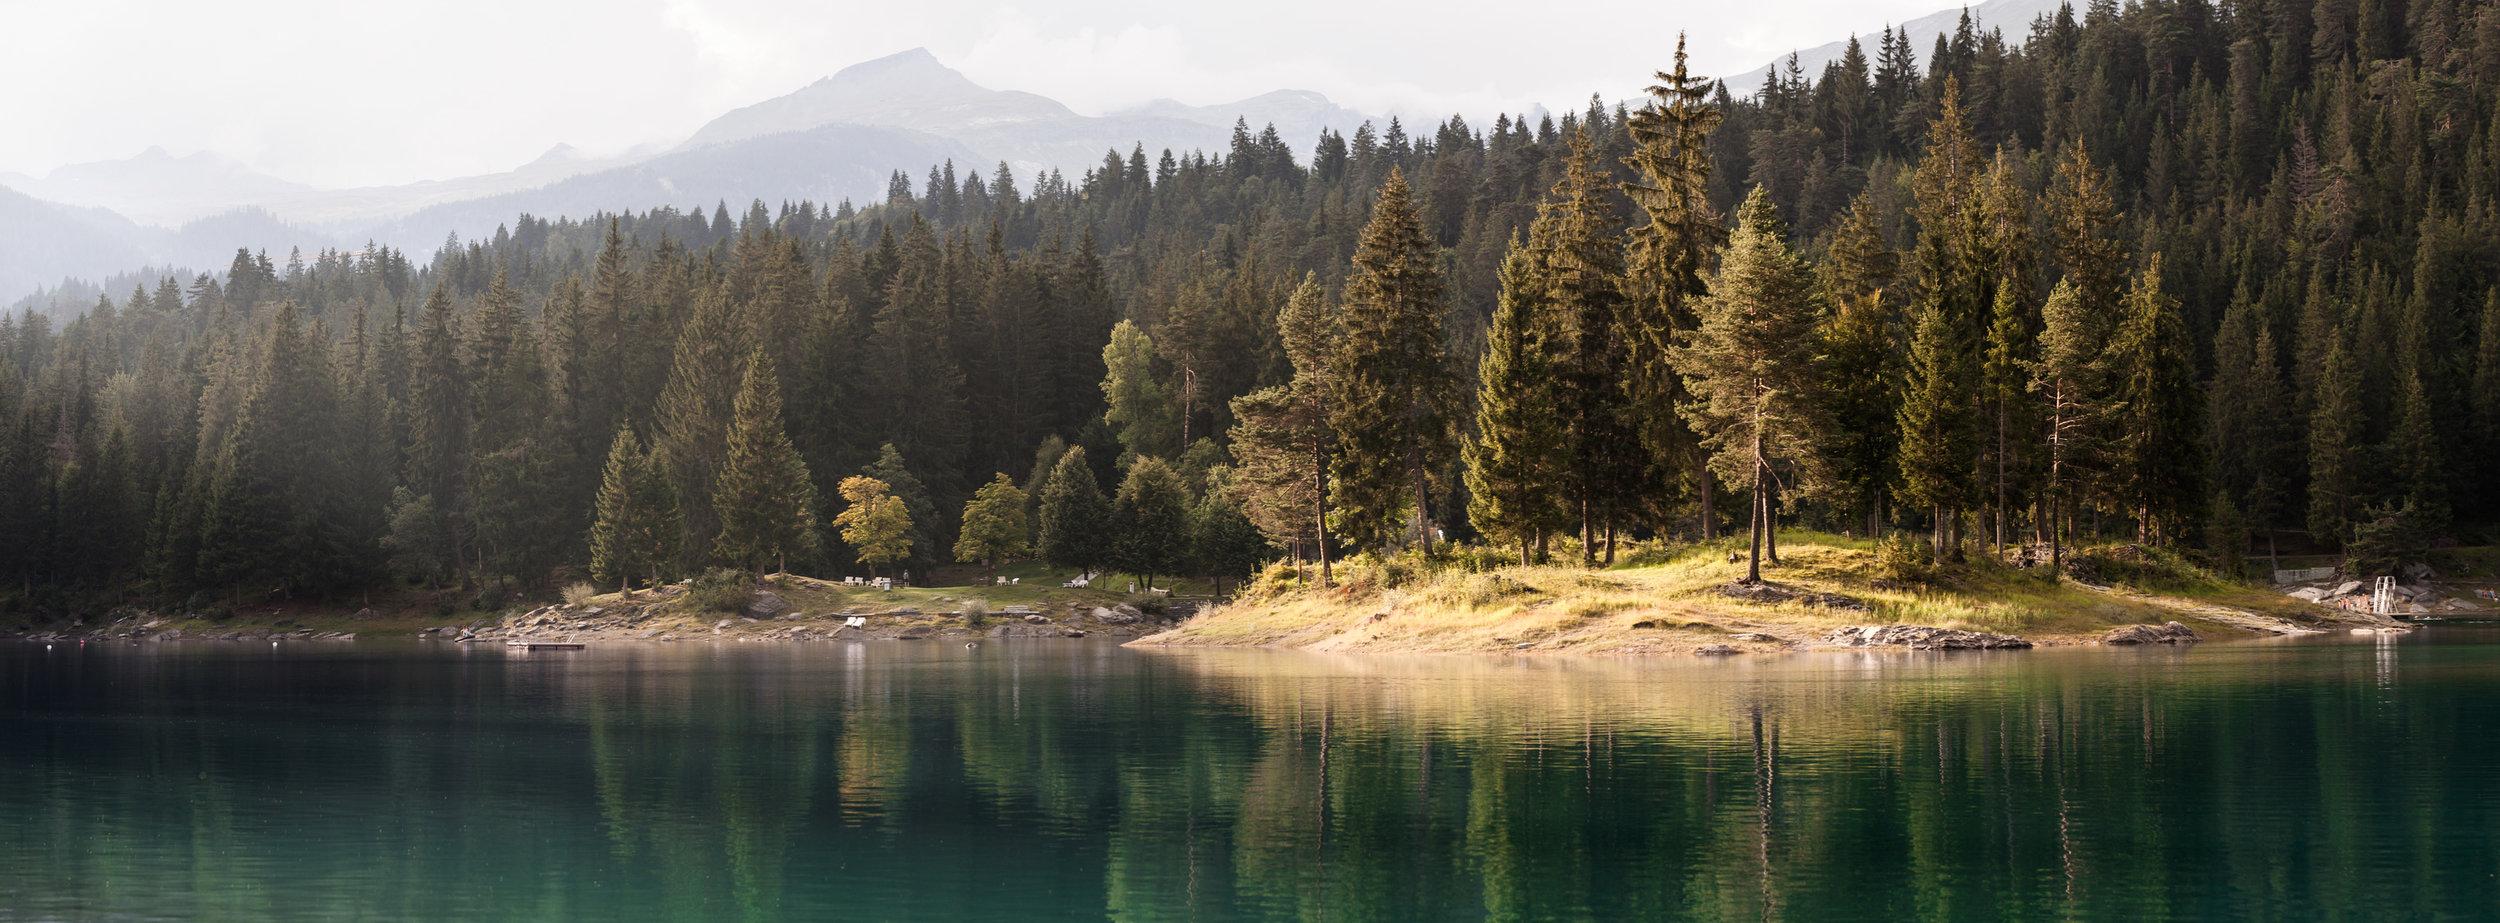 TomKluyver_Switzerland-1.jpg